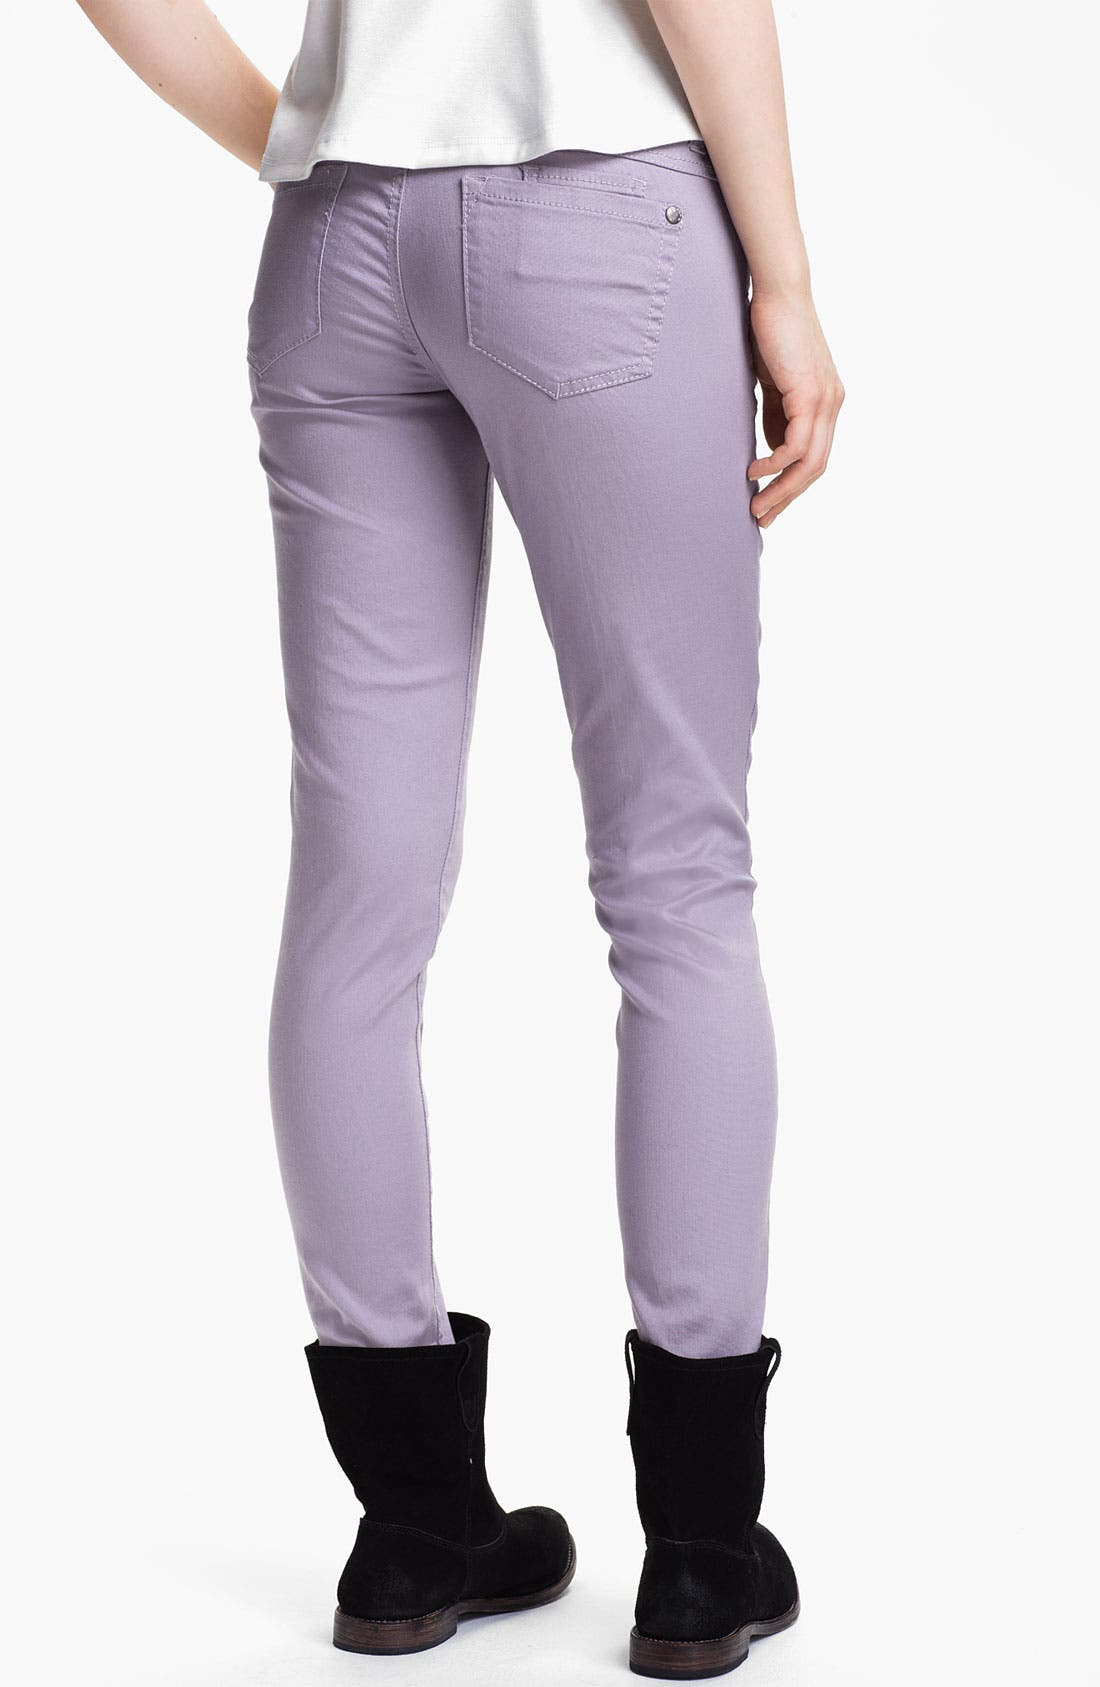 Alternate Image 1 Selected - Jolt Colored Stretch Denim Skinny Jeans (Juniors)